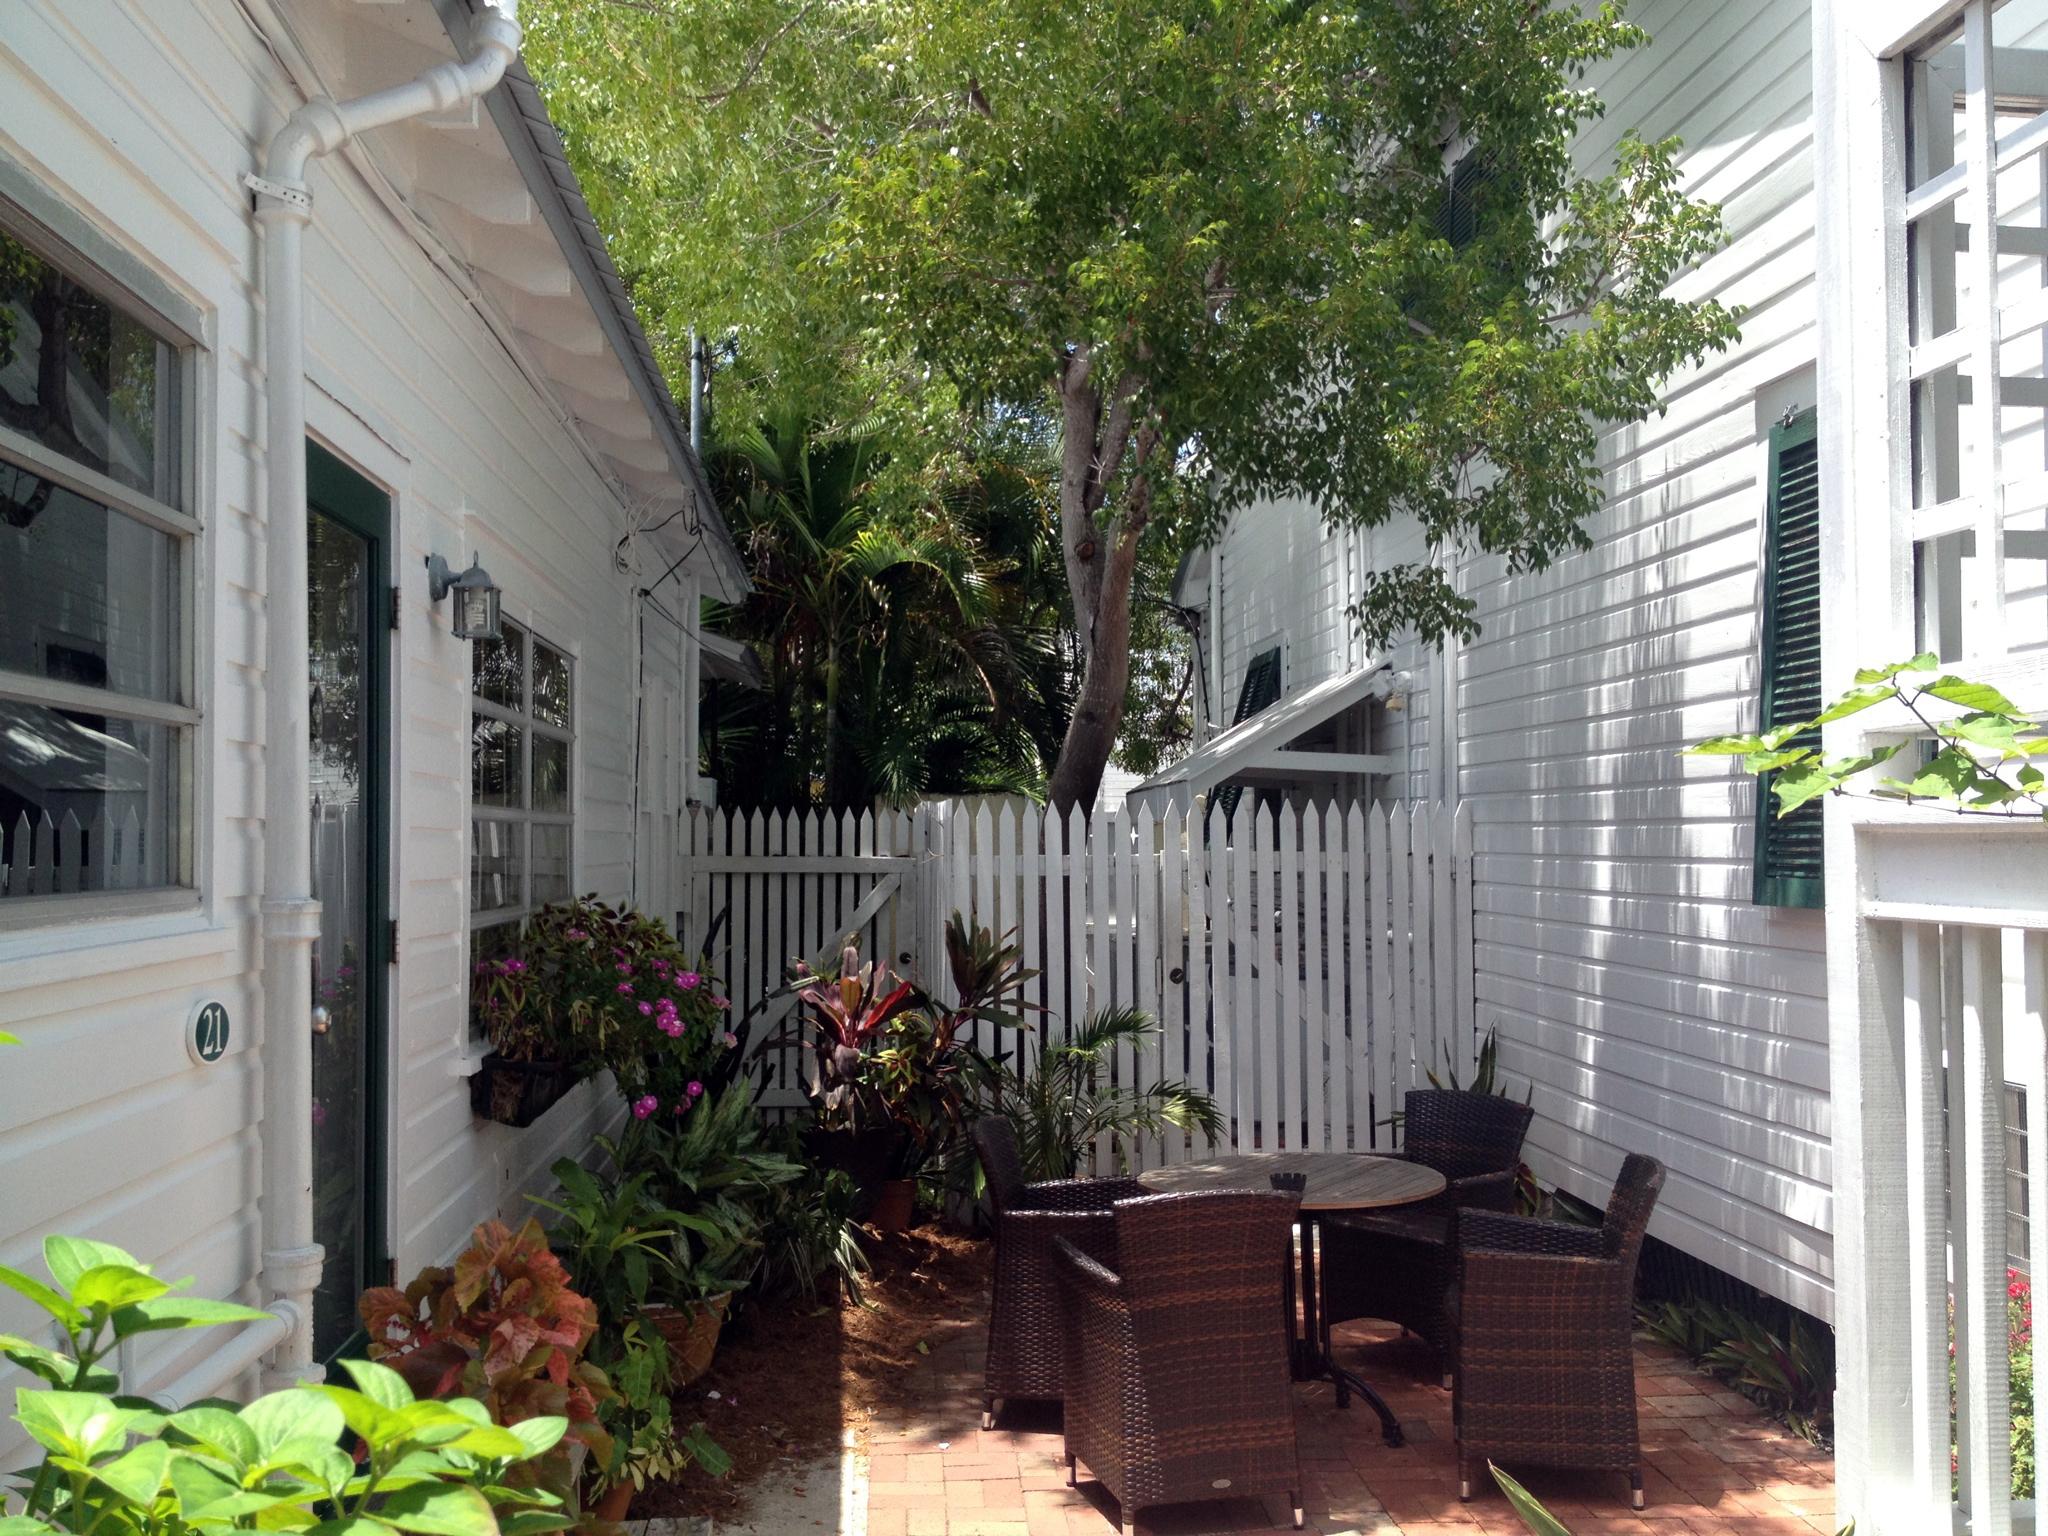 Merlin Guest House in Key West image 3